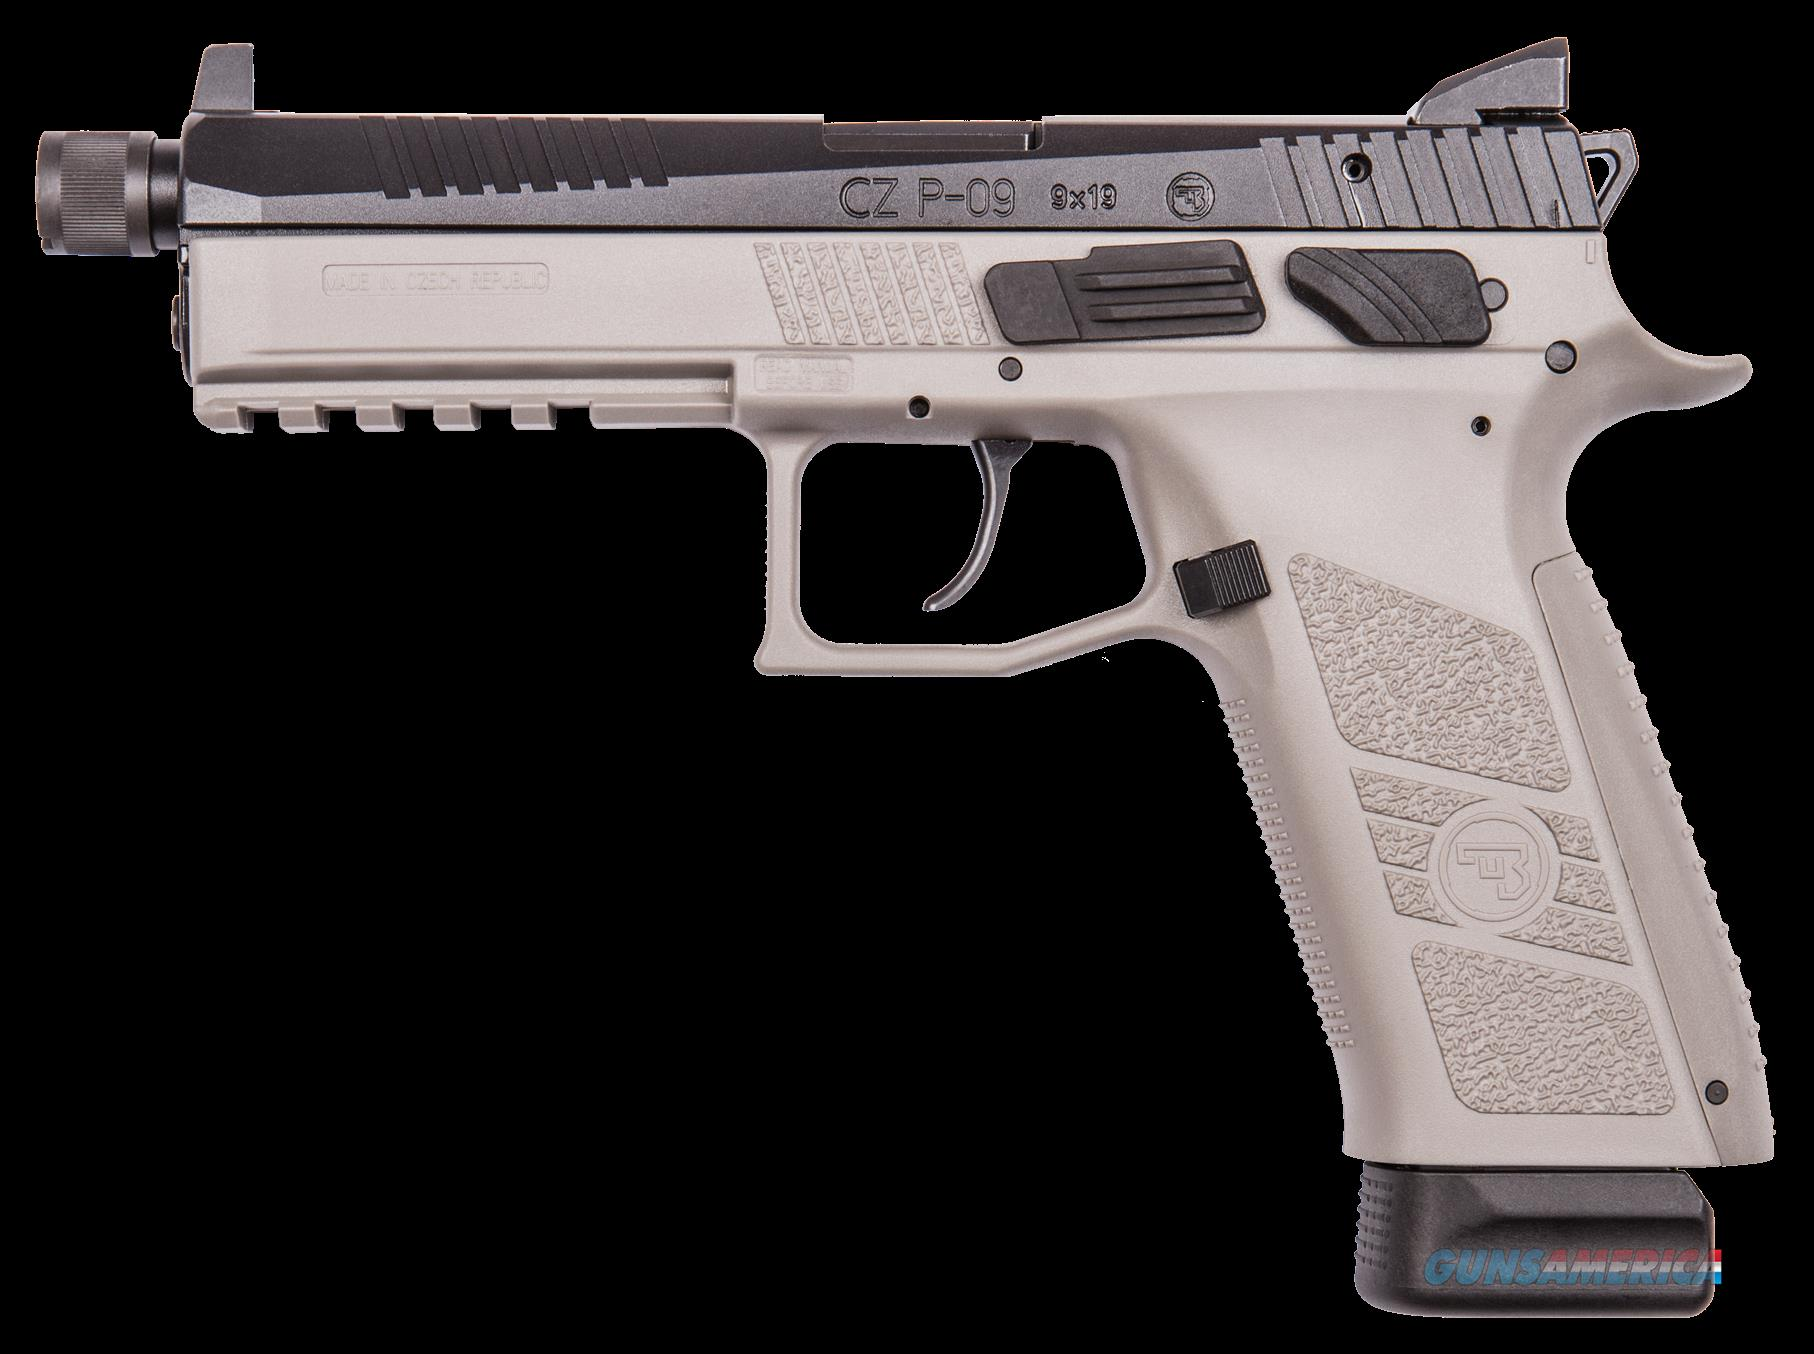 Cz P-09, Cz 91269 P09 9mm Ns Sr Grey-blk               21rd  Guns > Pistols > 1911 Pistol Copies (non-Colt)